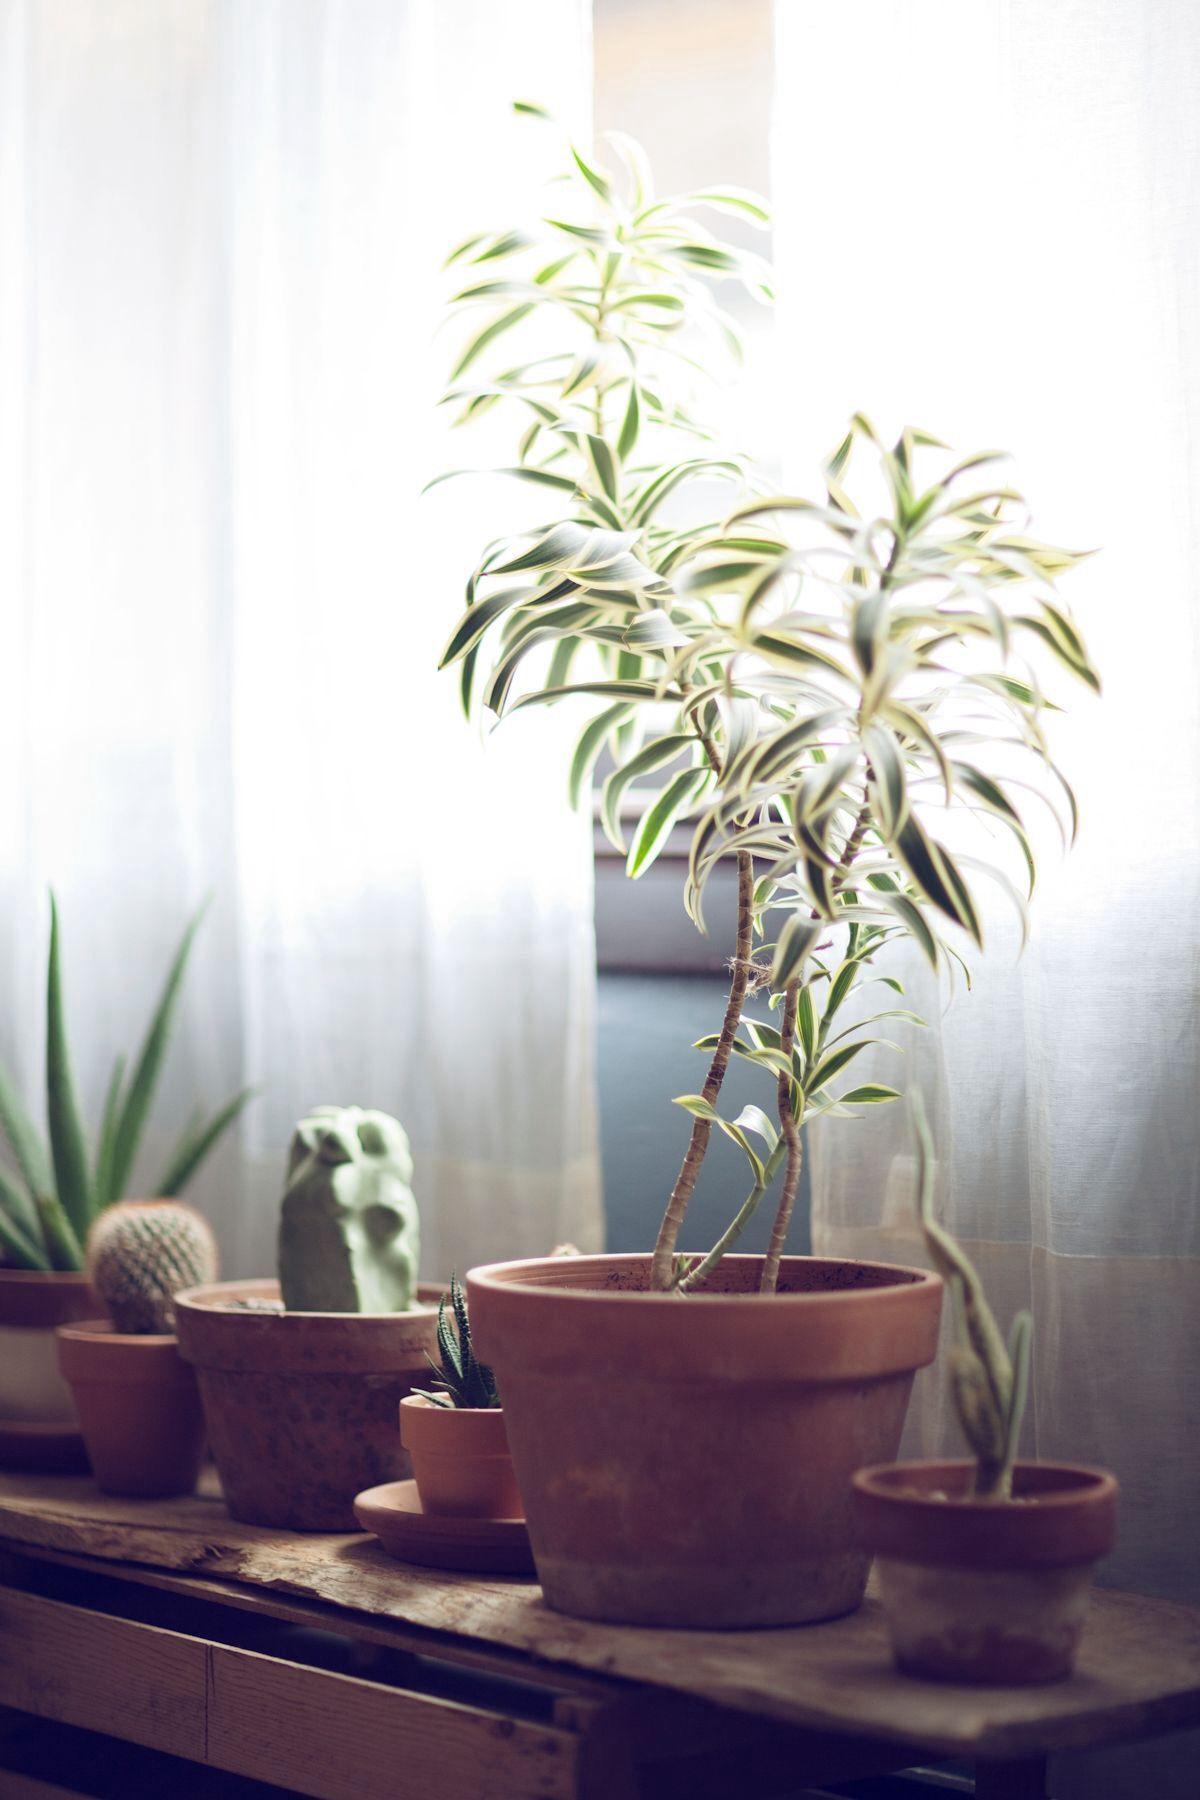 window plants room ideas pinterest plantes plante. Black Bedroom Furniture Sets. Home Design Ideas